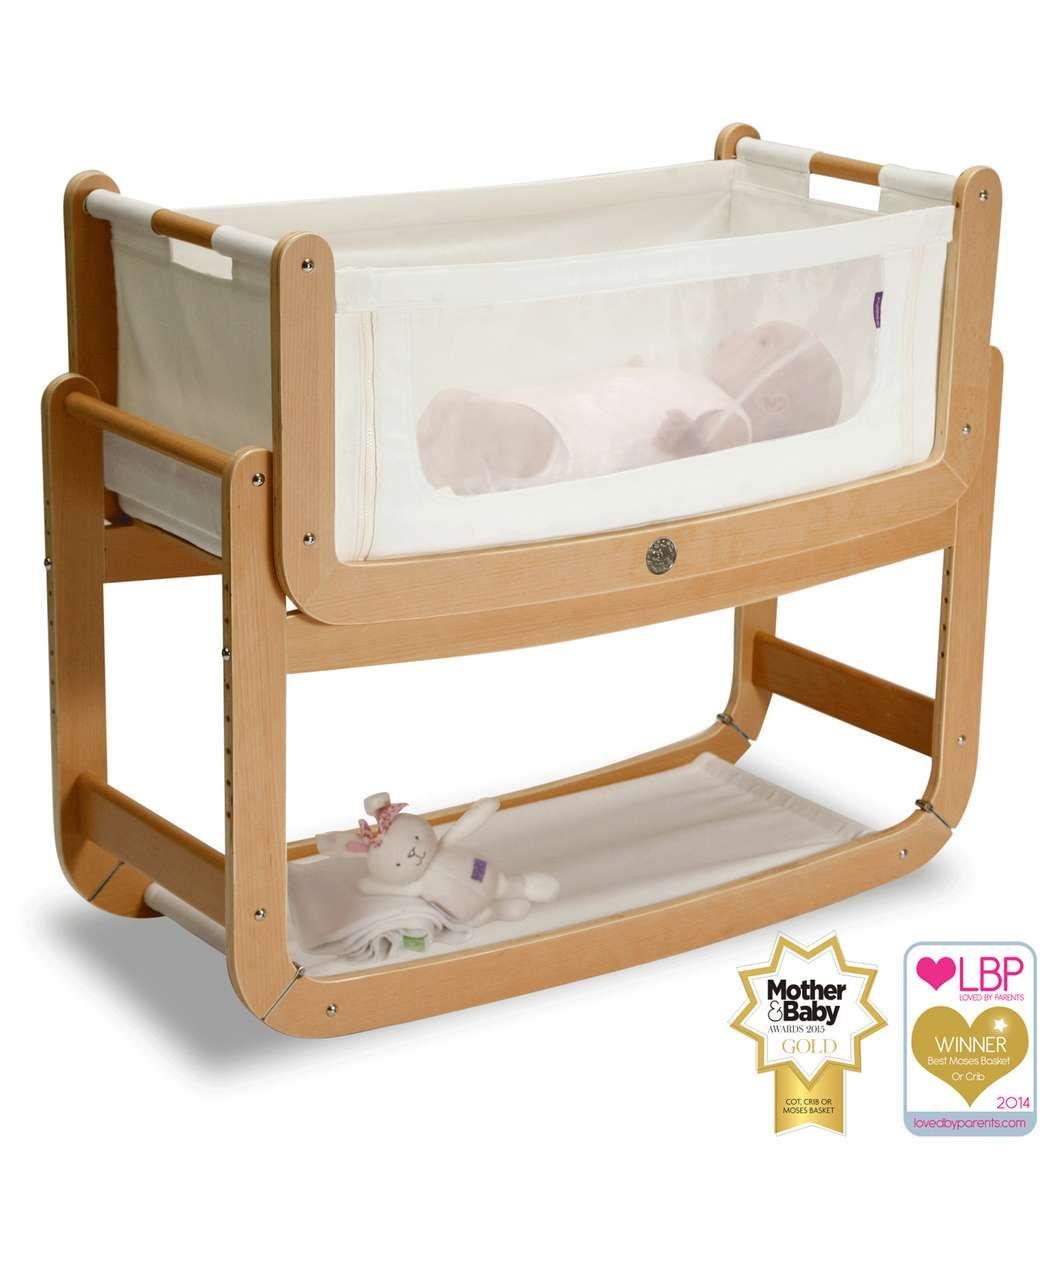 Baby crib vs cot - Snuzpod 3 In 1 Bedside Crib Natural Cot Beds Cots Cribs